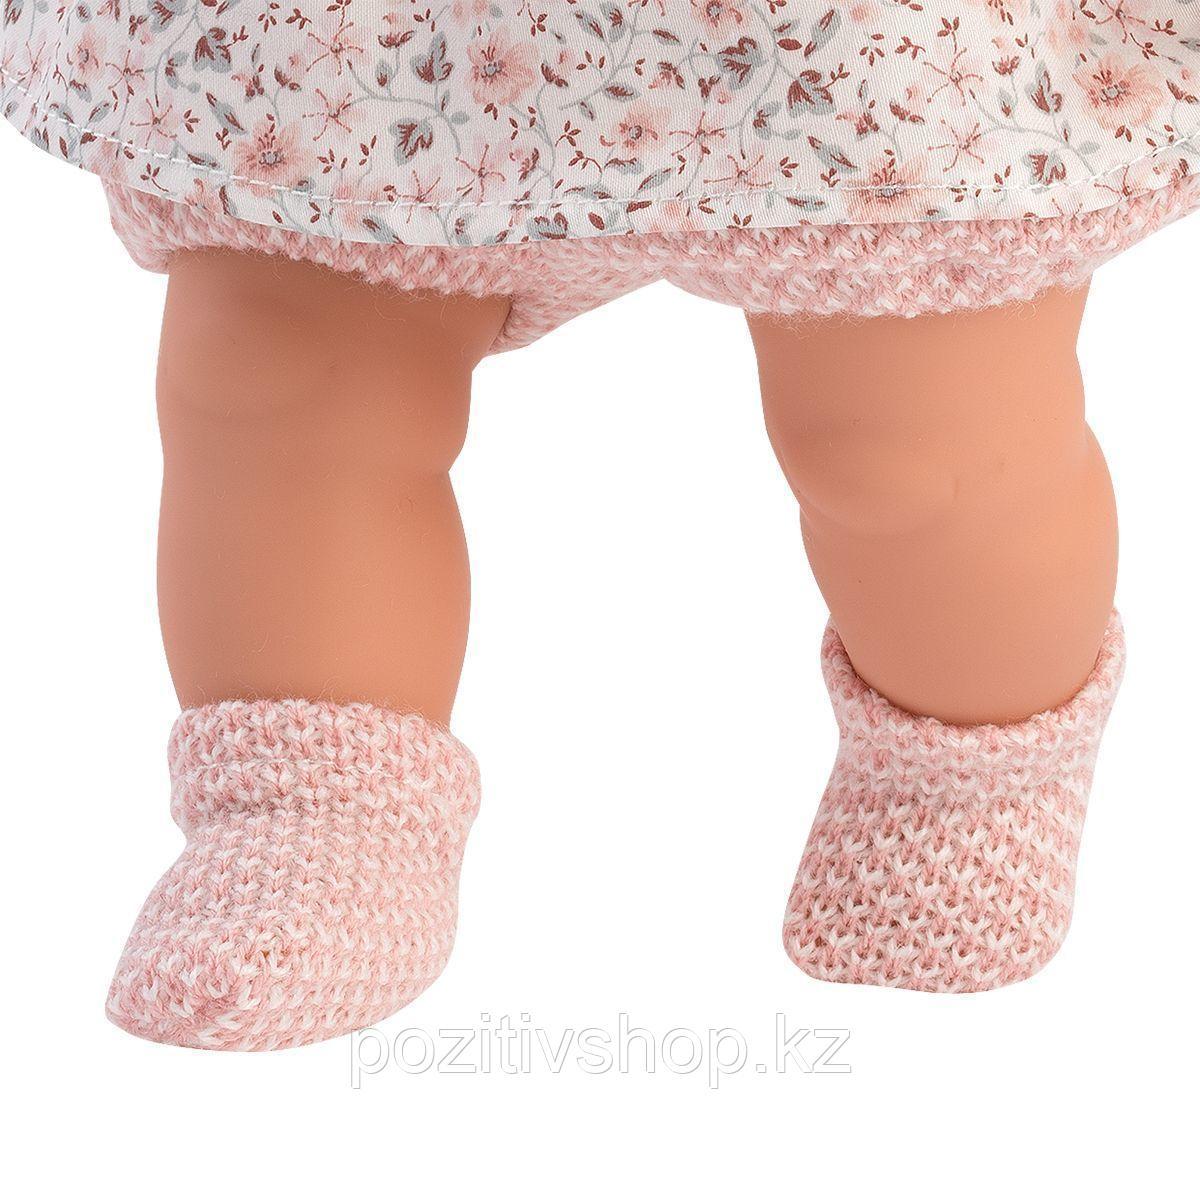 Кукла Llorens Роберта 33 см. блондинка в светло-розовом жакете - фото 3